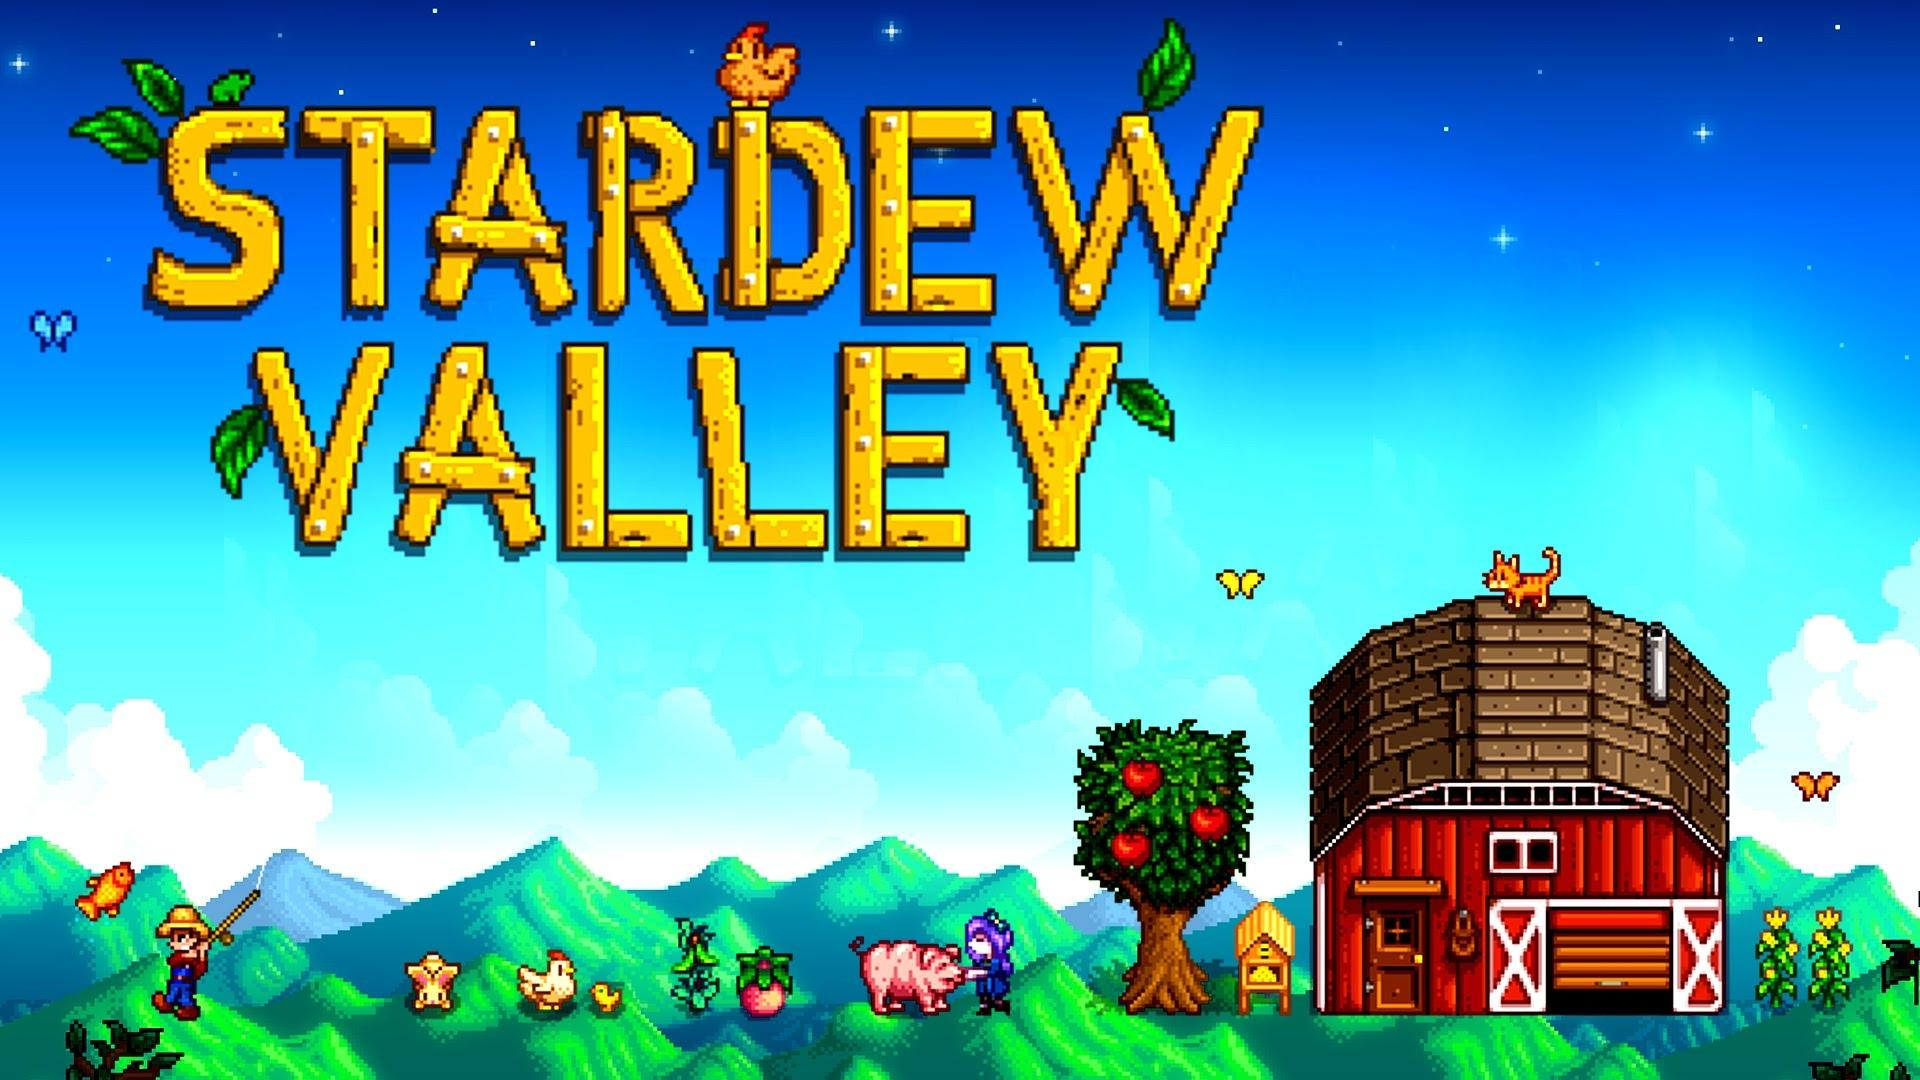 Stardew Valley Wallpaper Hd Download